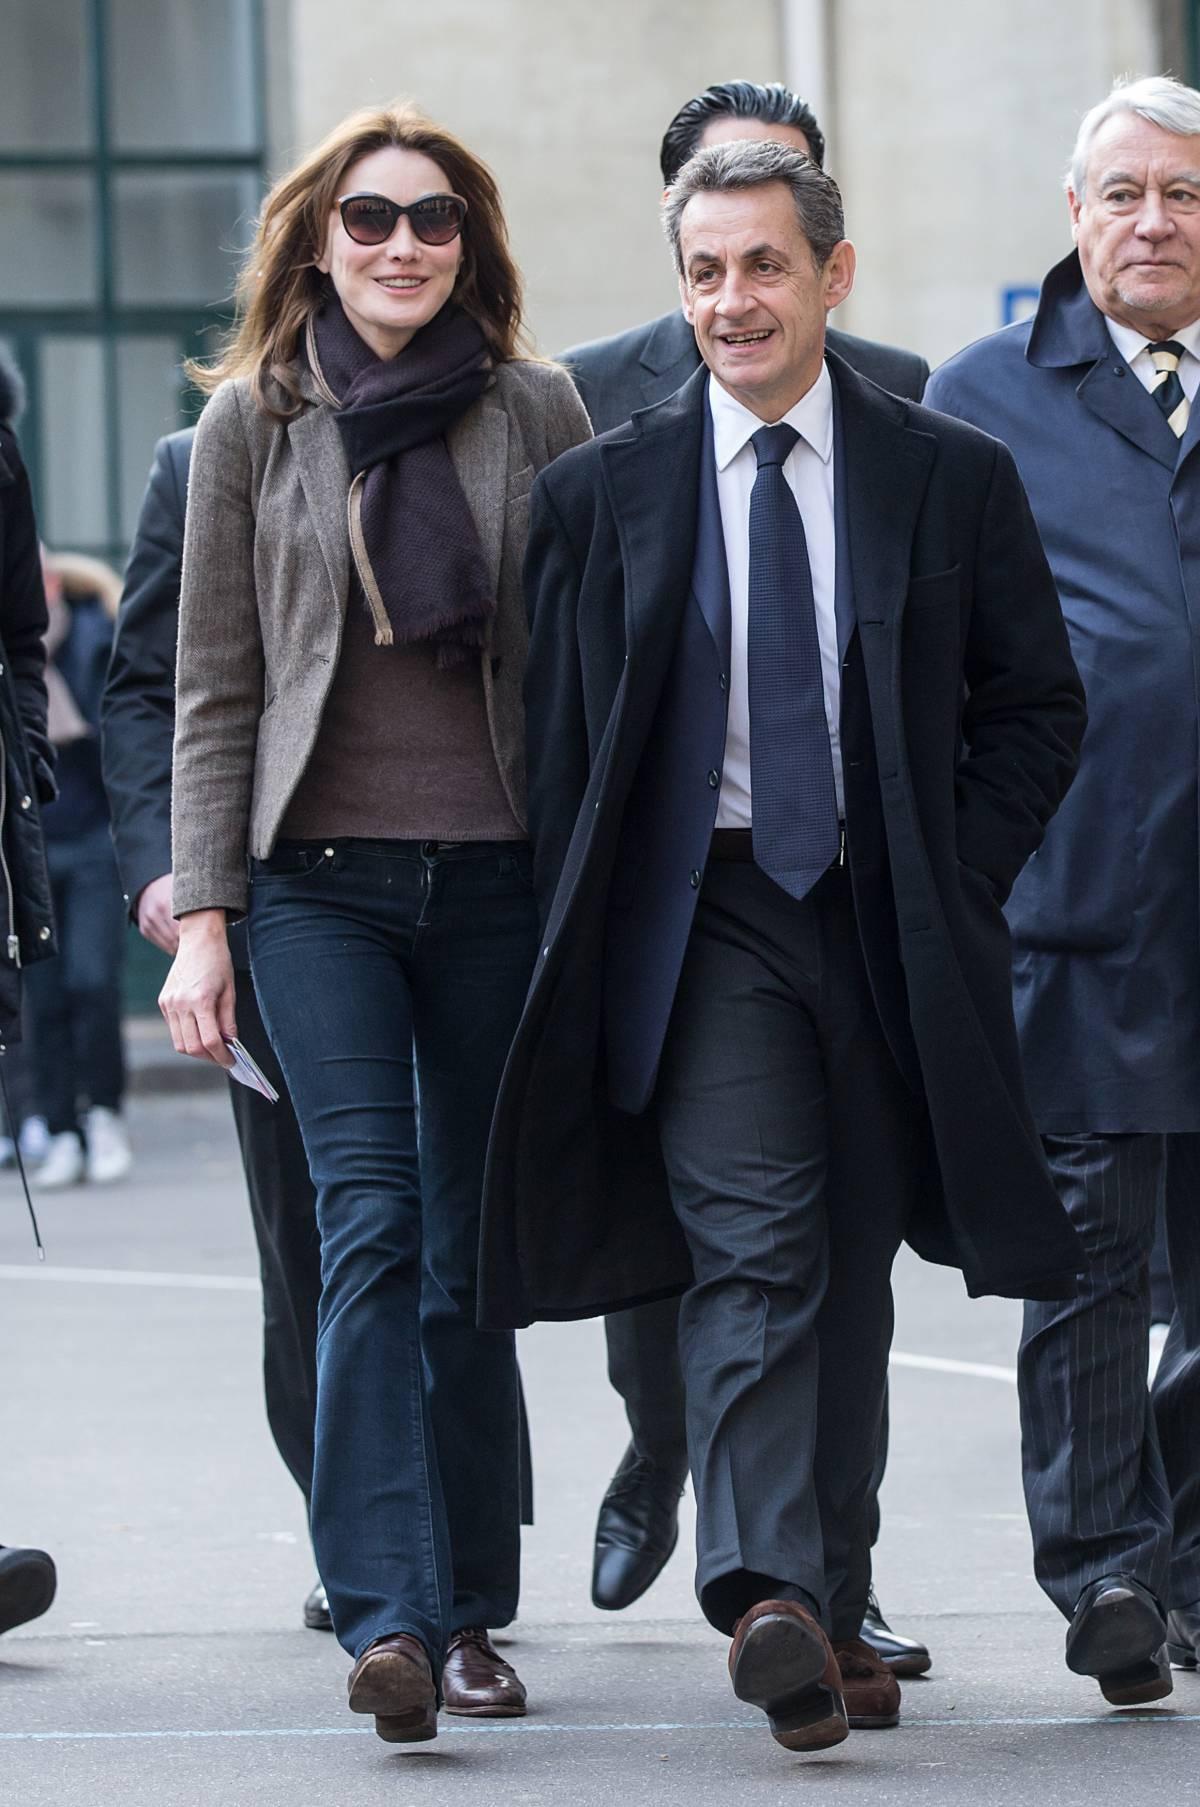 Николя Саркози и Карла Бруни фото